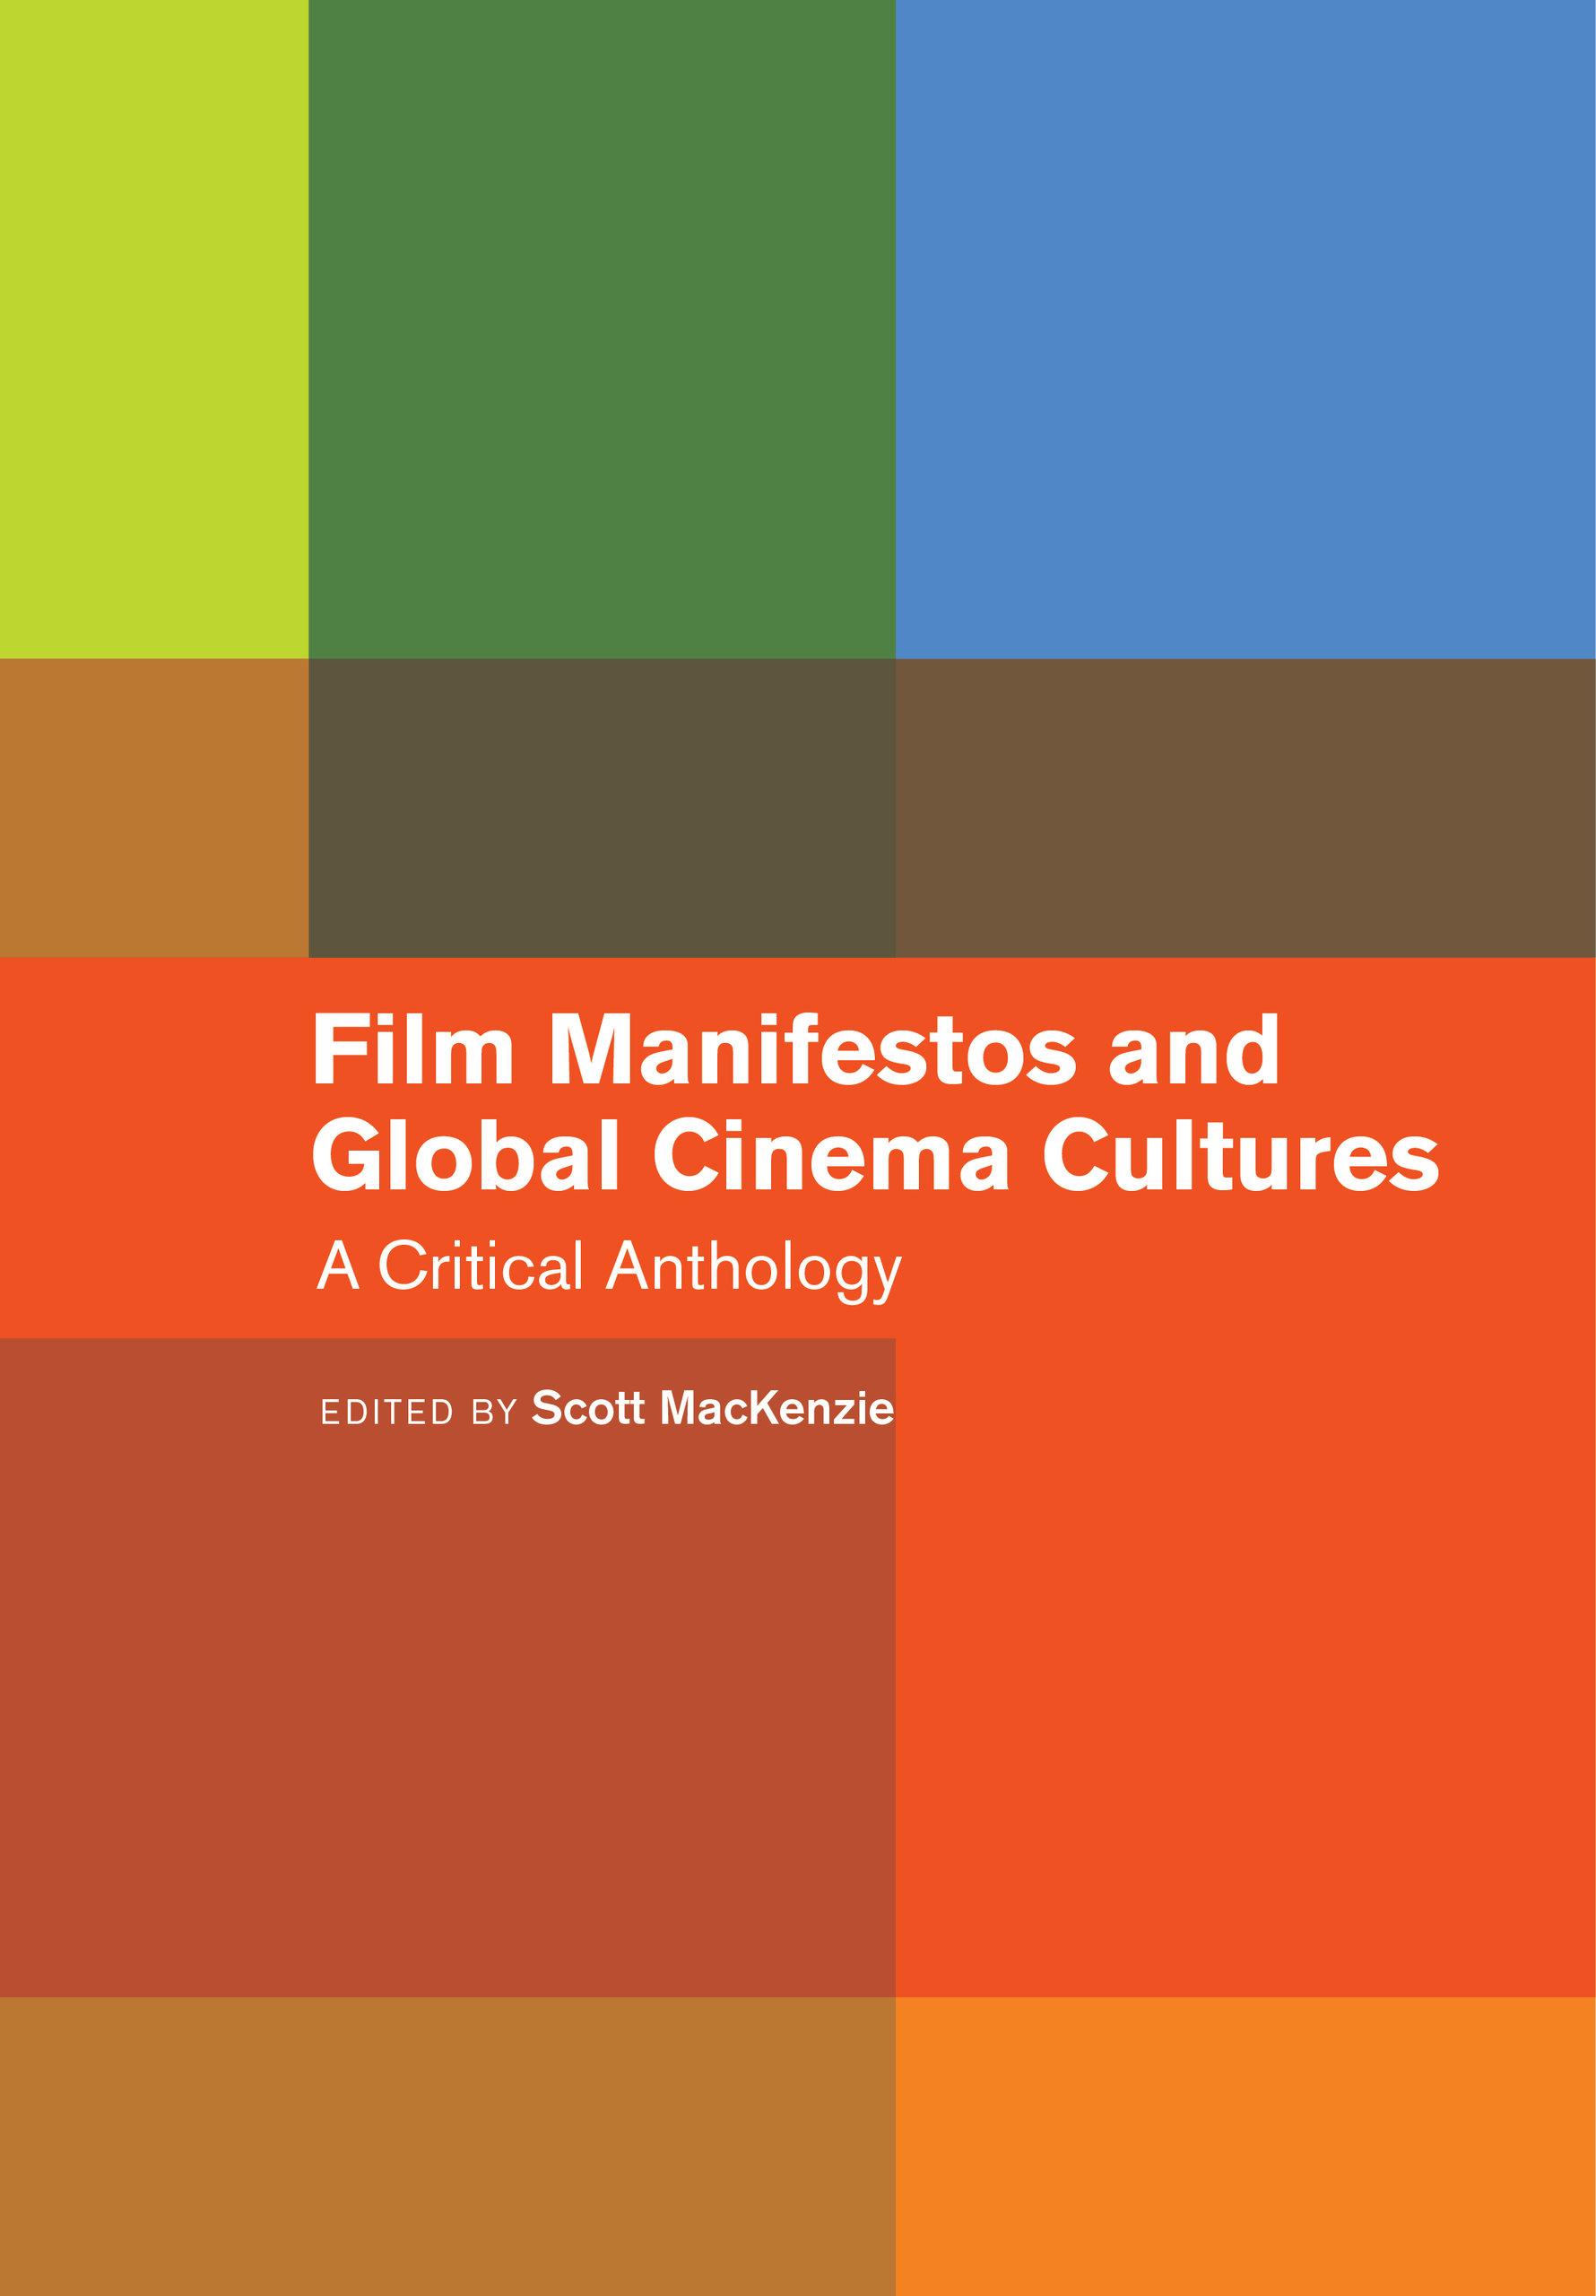 Film Manifestos And Global Cinema Cultures By Scott Mackenzie Paperback University Of California Press